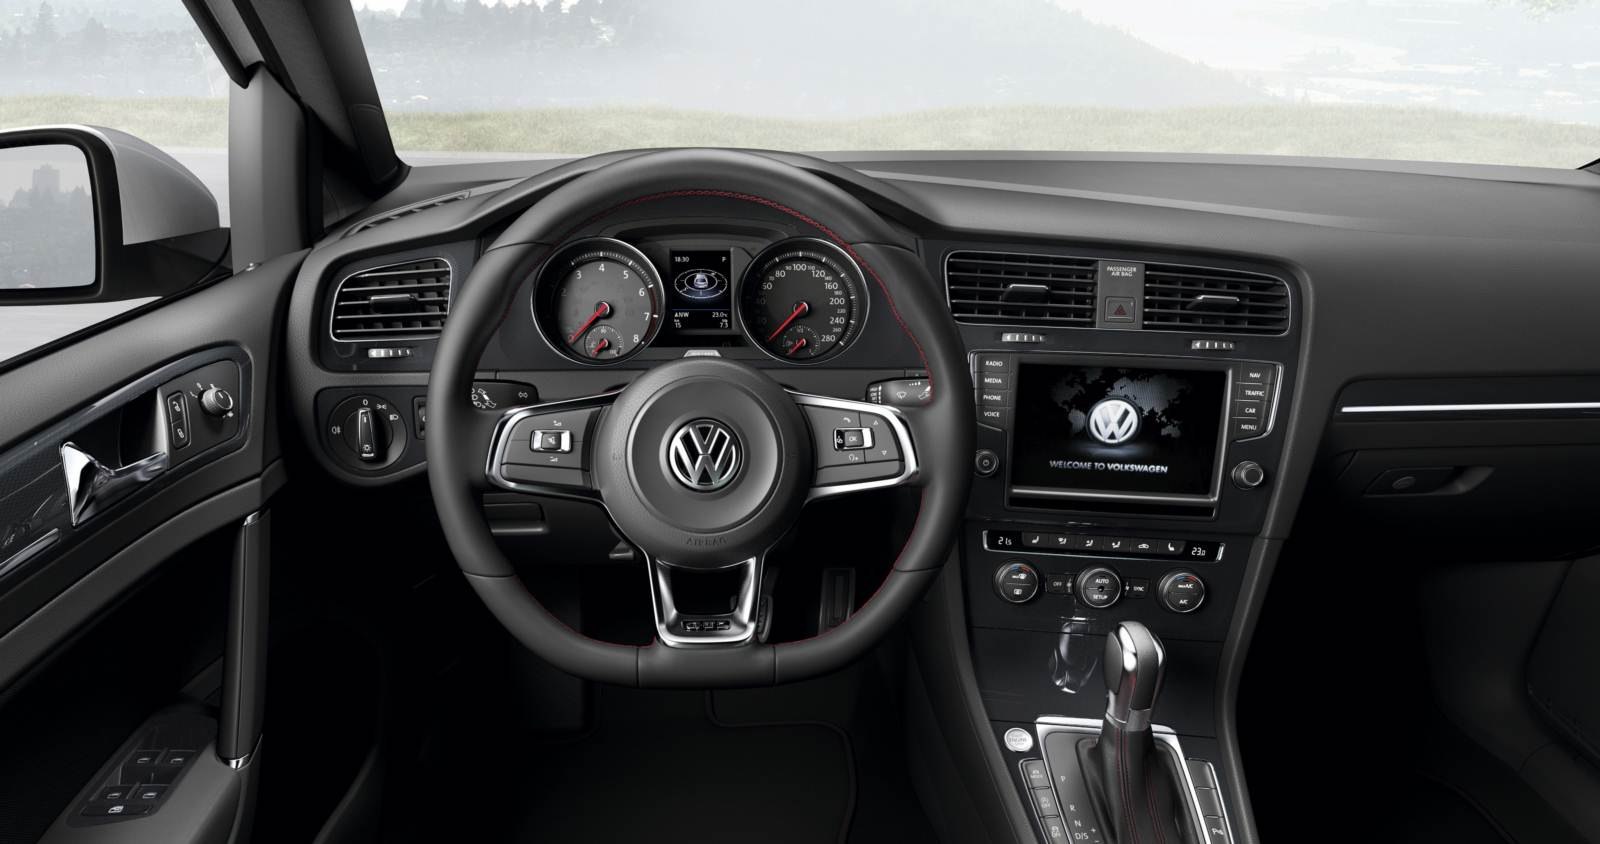 VW Golf GTI - aumento de preço